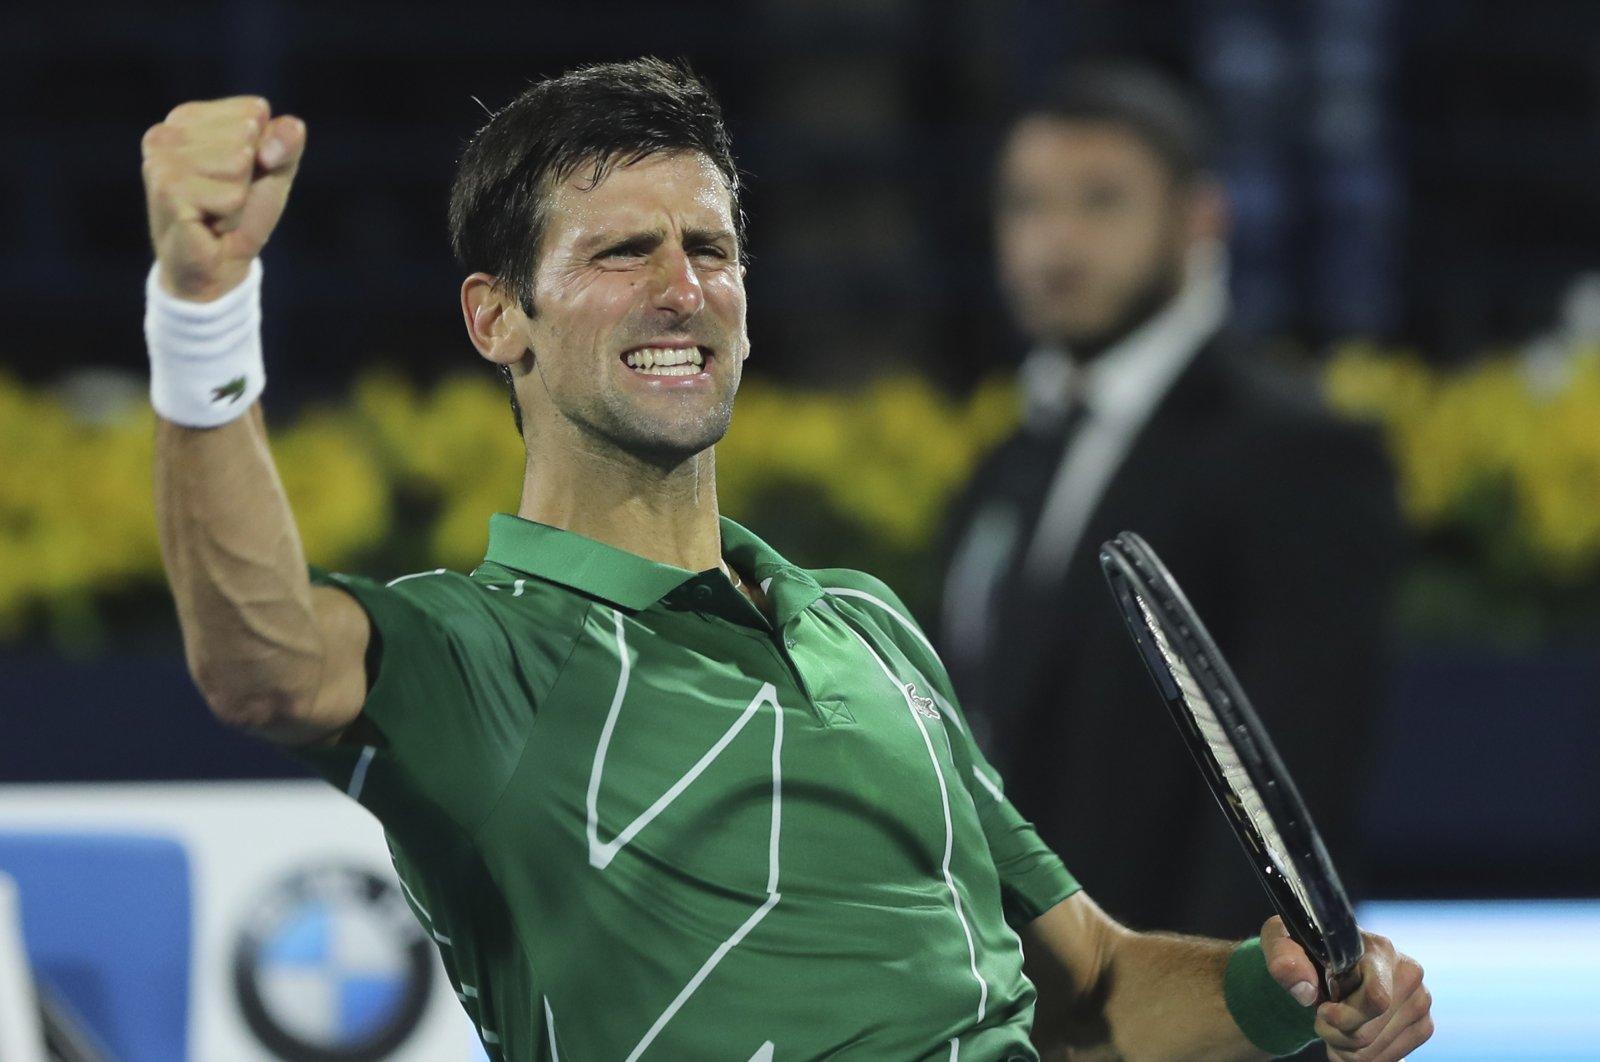 Novak Djokovic celebrates after he beating Stefanos Tsitsipas in the final match of the Dubai Duty Free Tennis Championship in Dubai, United Arab Emirates, Feb. 29, 2020. (AP Photo)